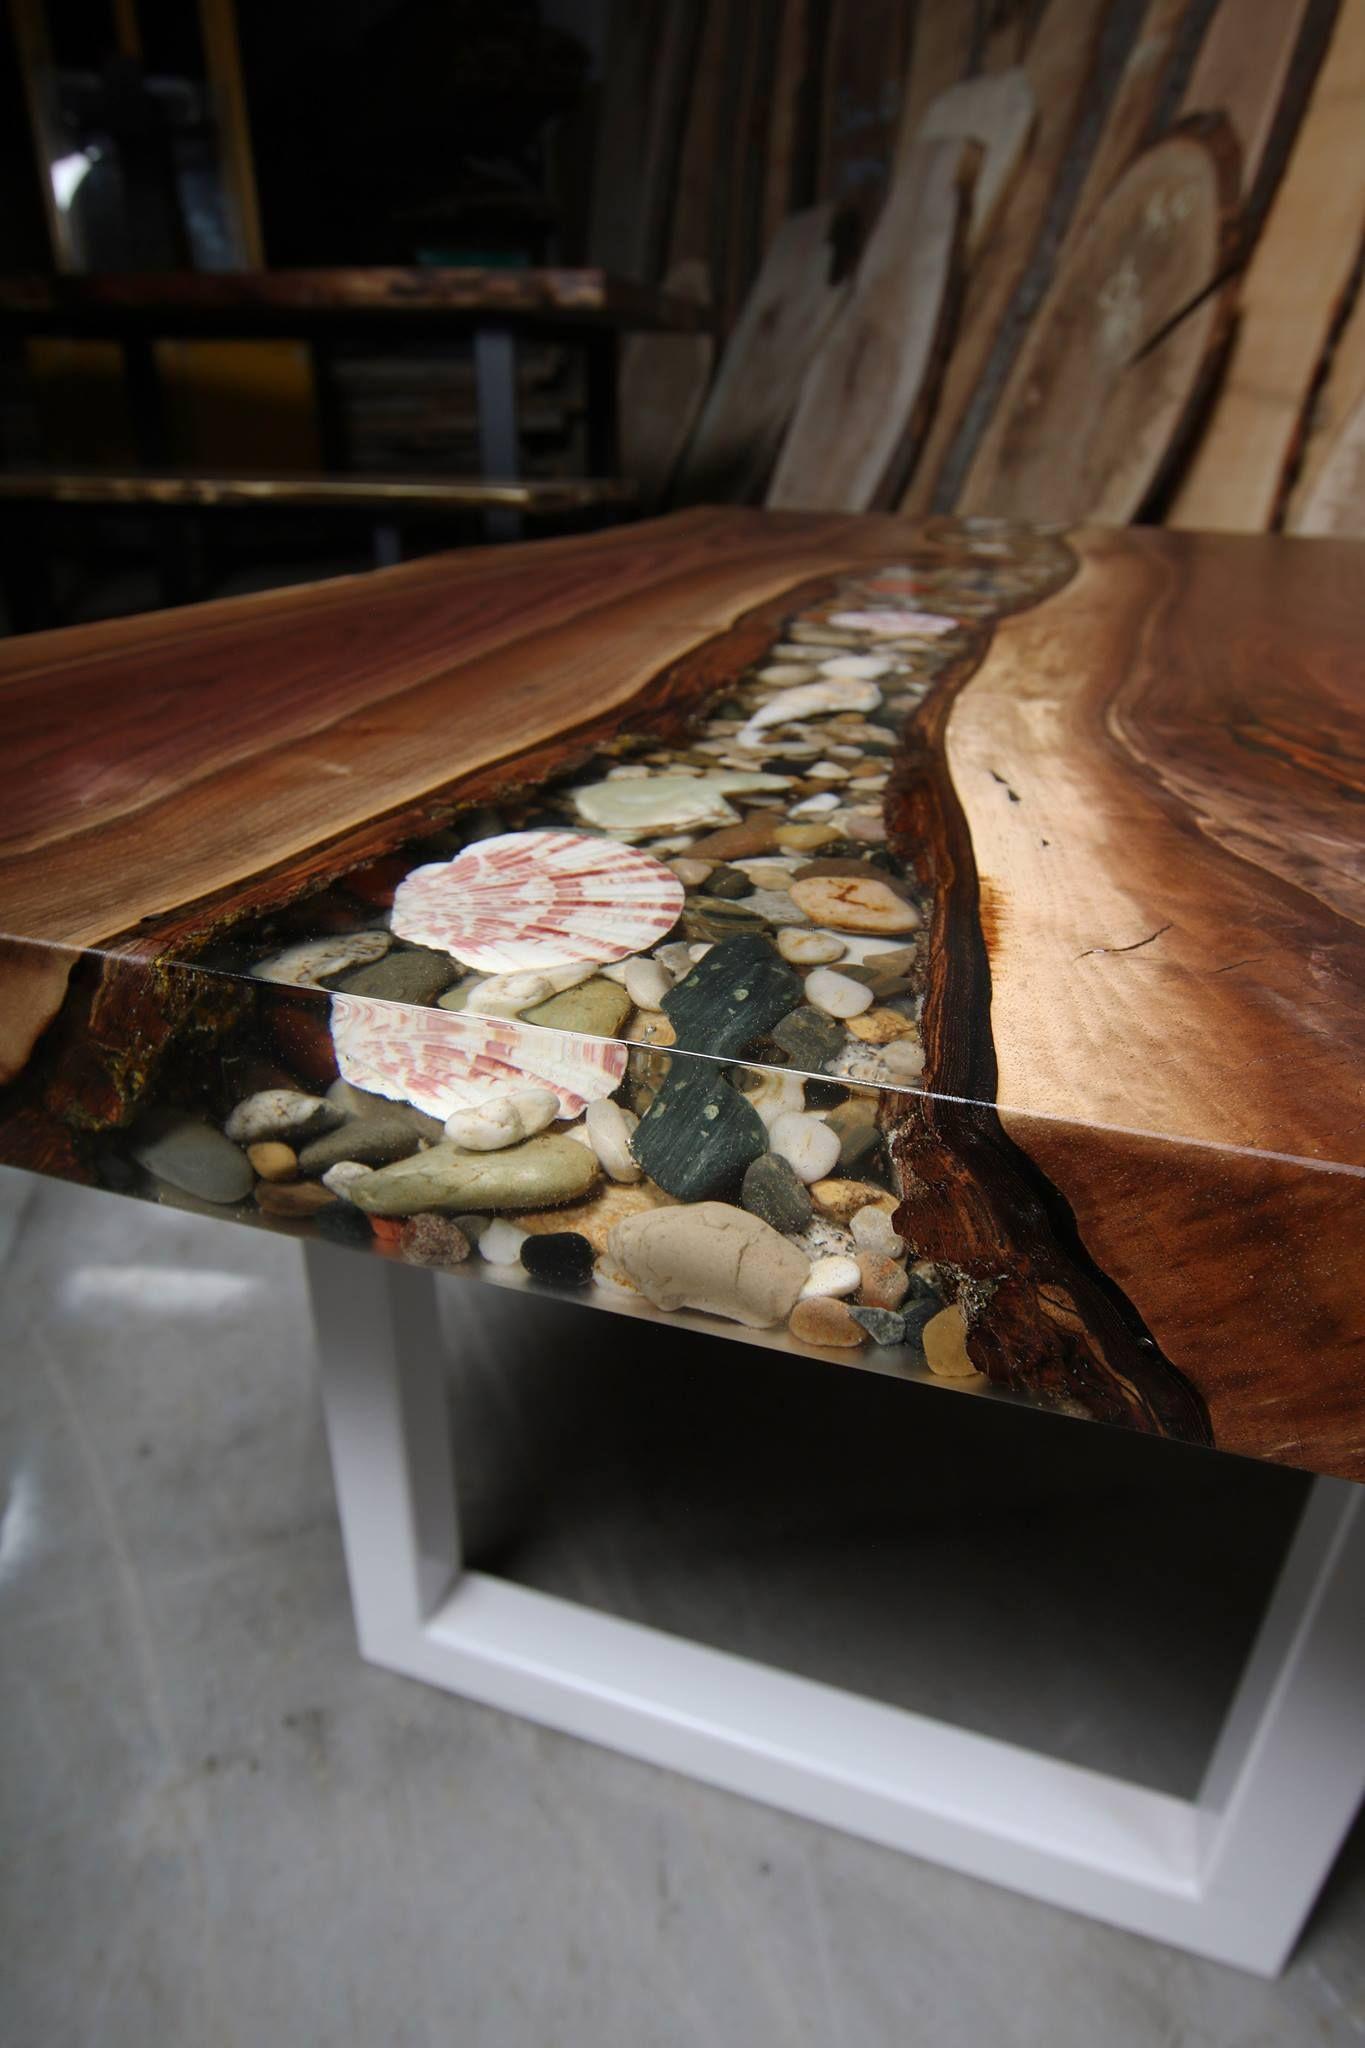 Live Edge Walnut Coffee Table with Rock filled River - Anglewood Live Edge Custom Furniture, Toronto